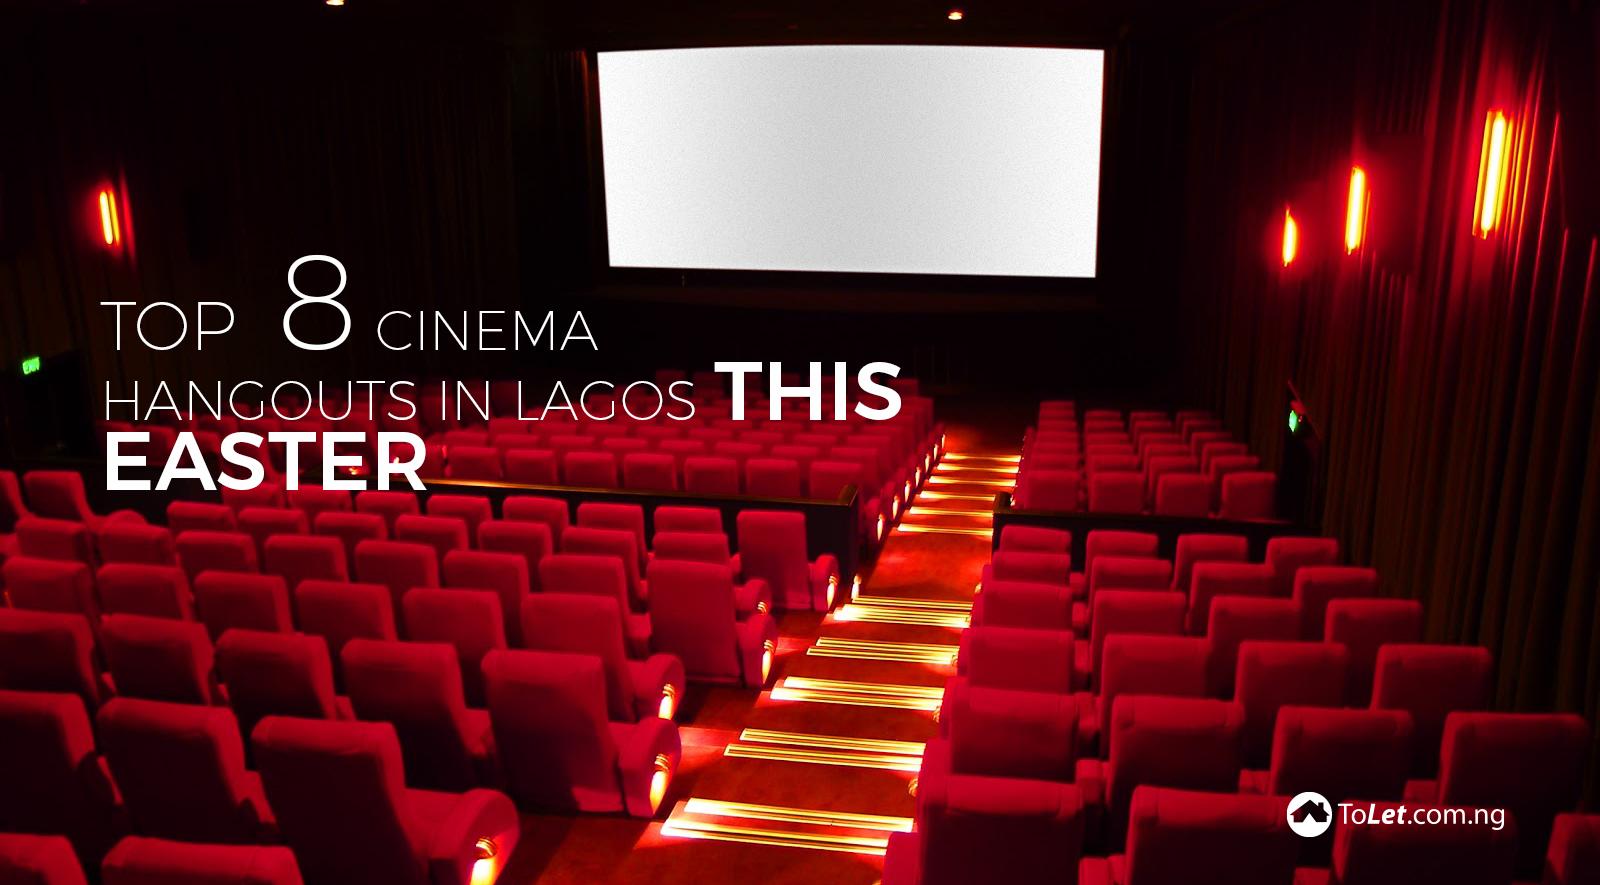 Top 8 Cinemas to hangout in Lagos